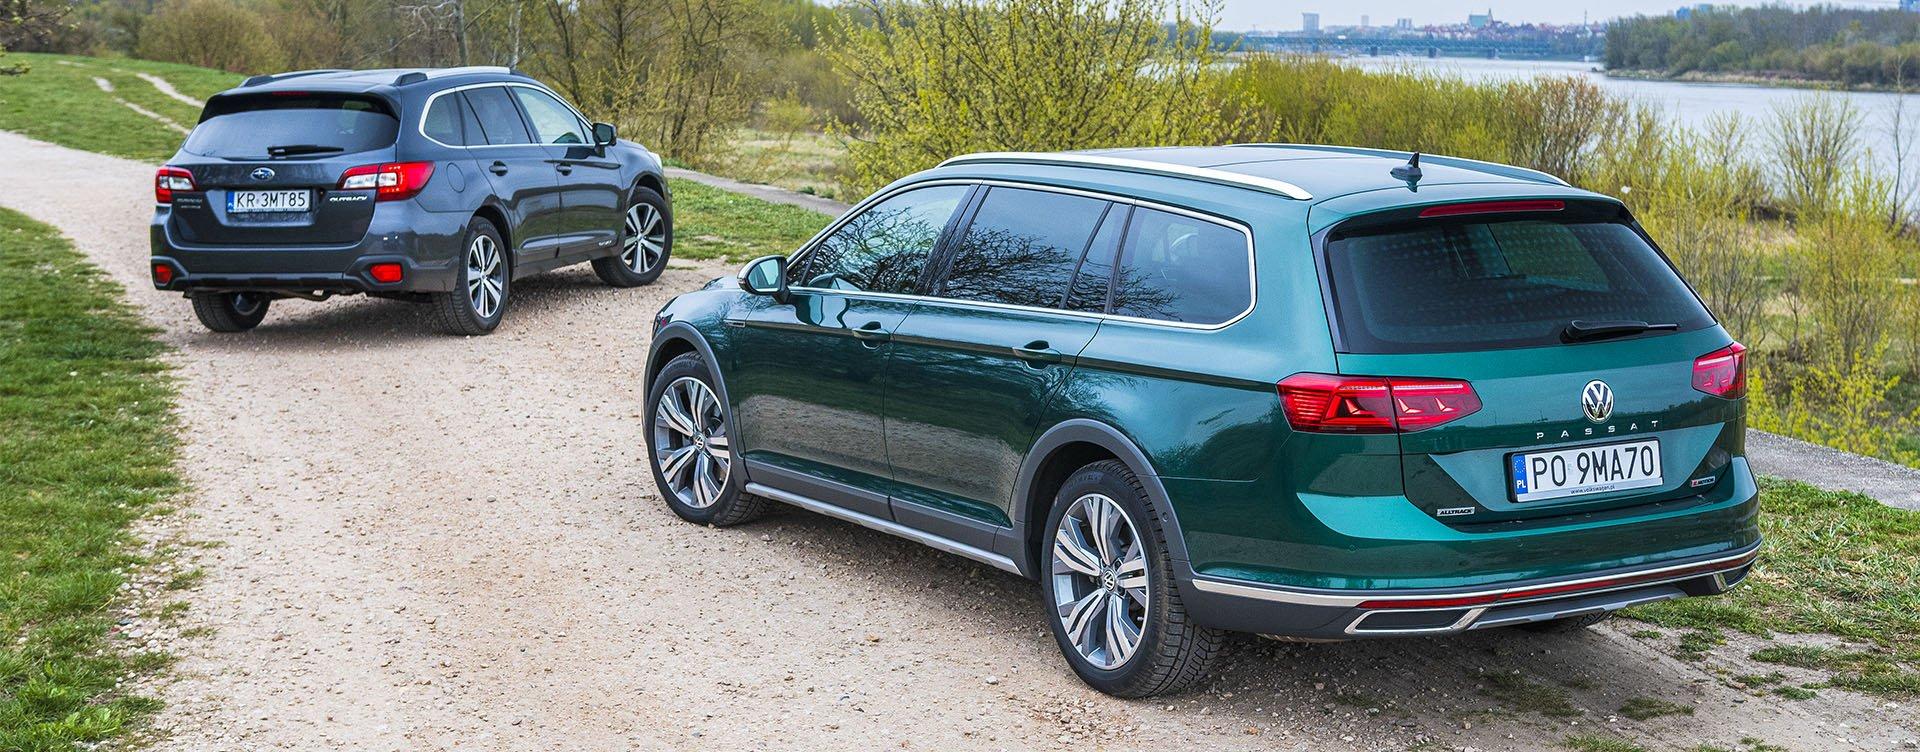 Subaru Outback, Volkswagen Passat Alltrack - widok z tyłu